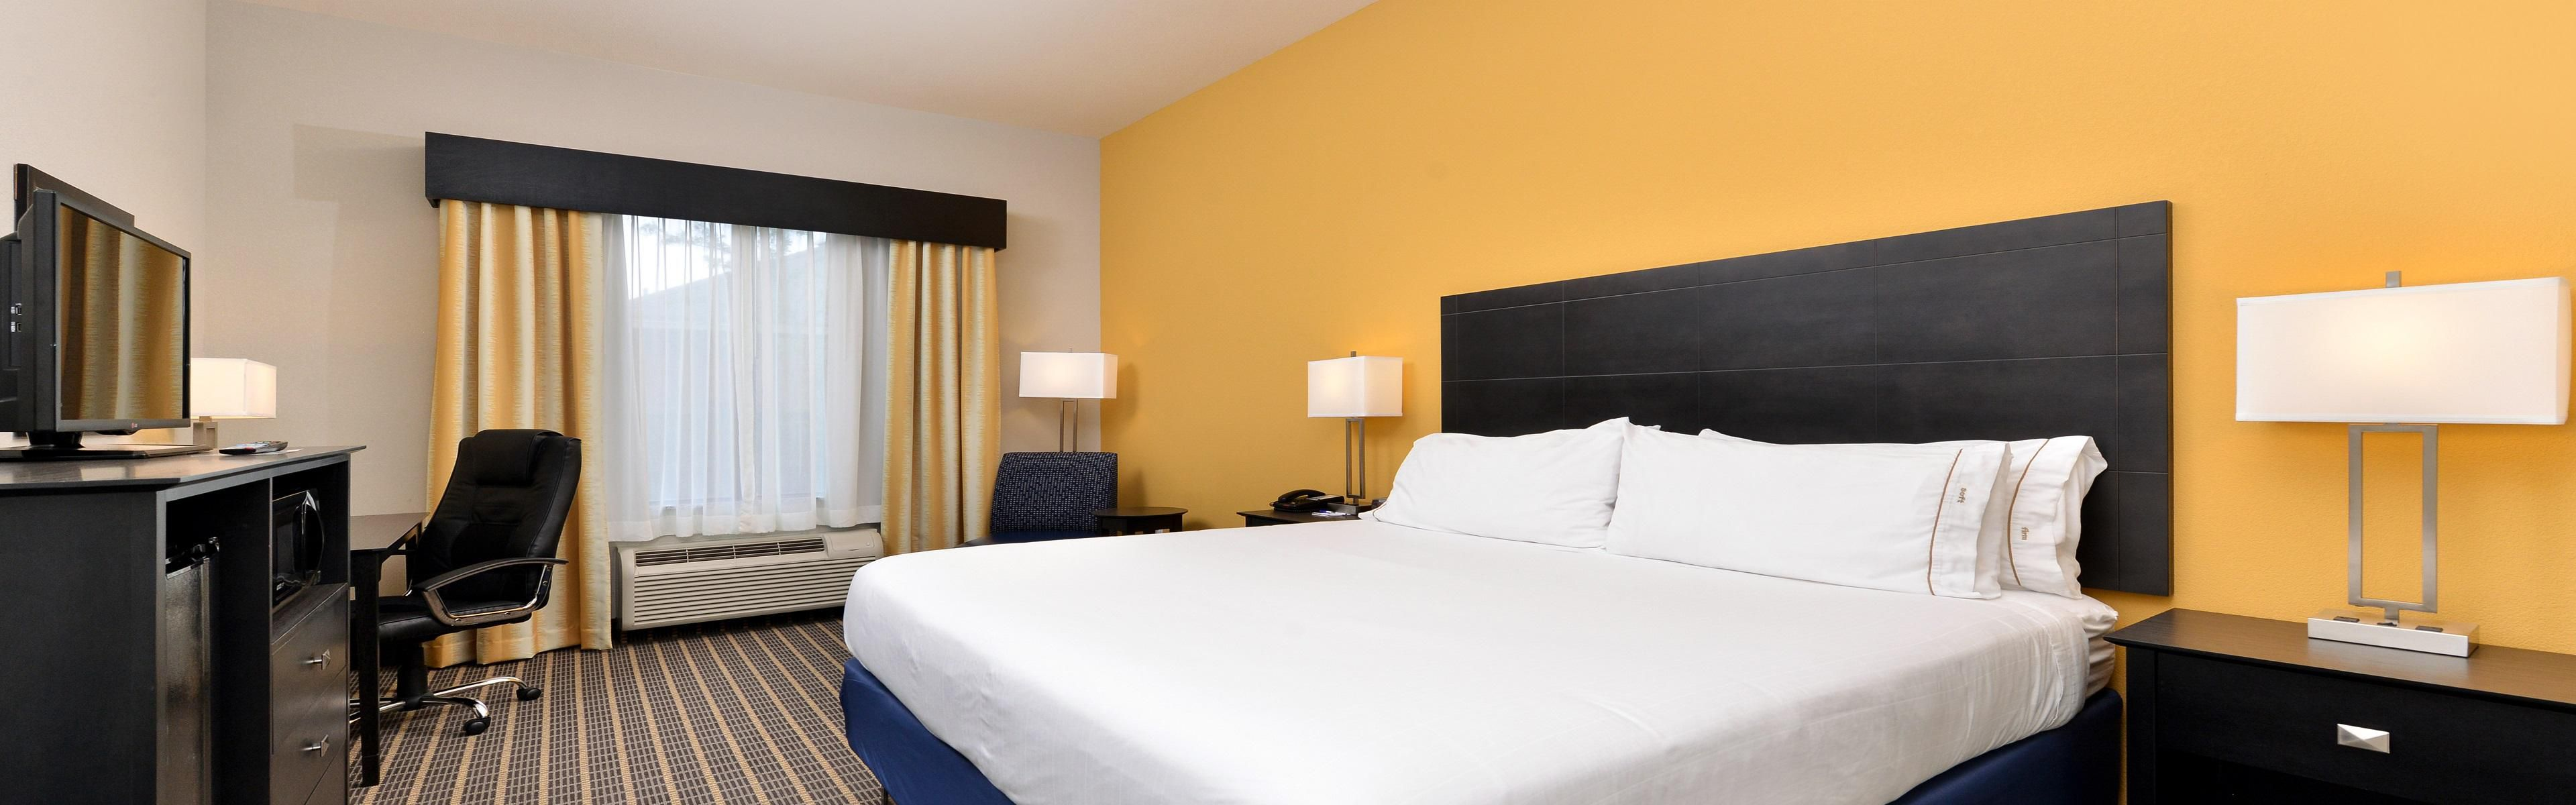 Holiday Inn Express & Suites Ft. Walton Bch - Hurlburt Area image 1